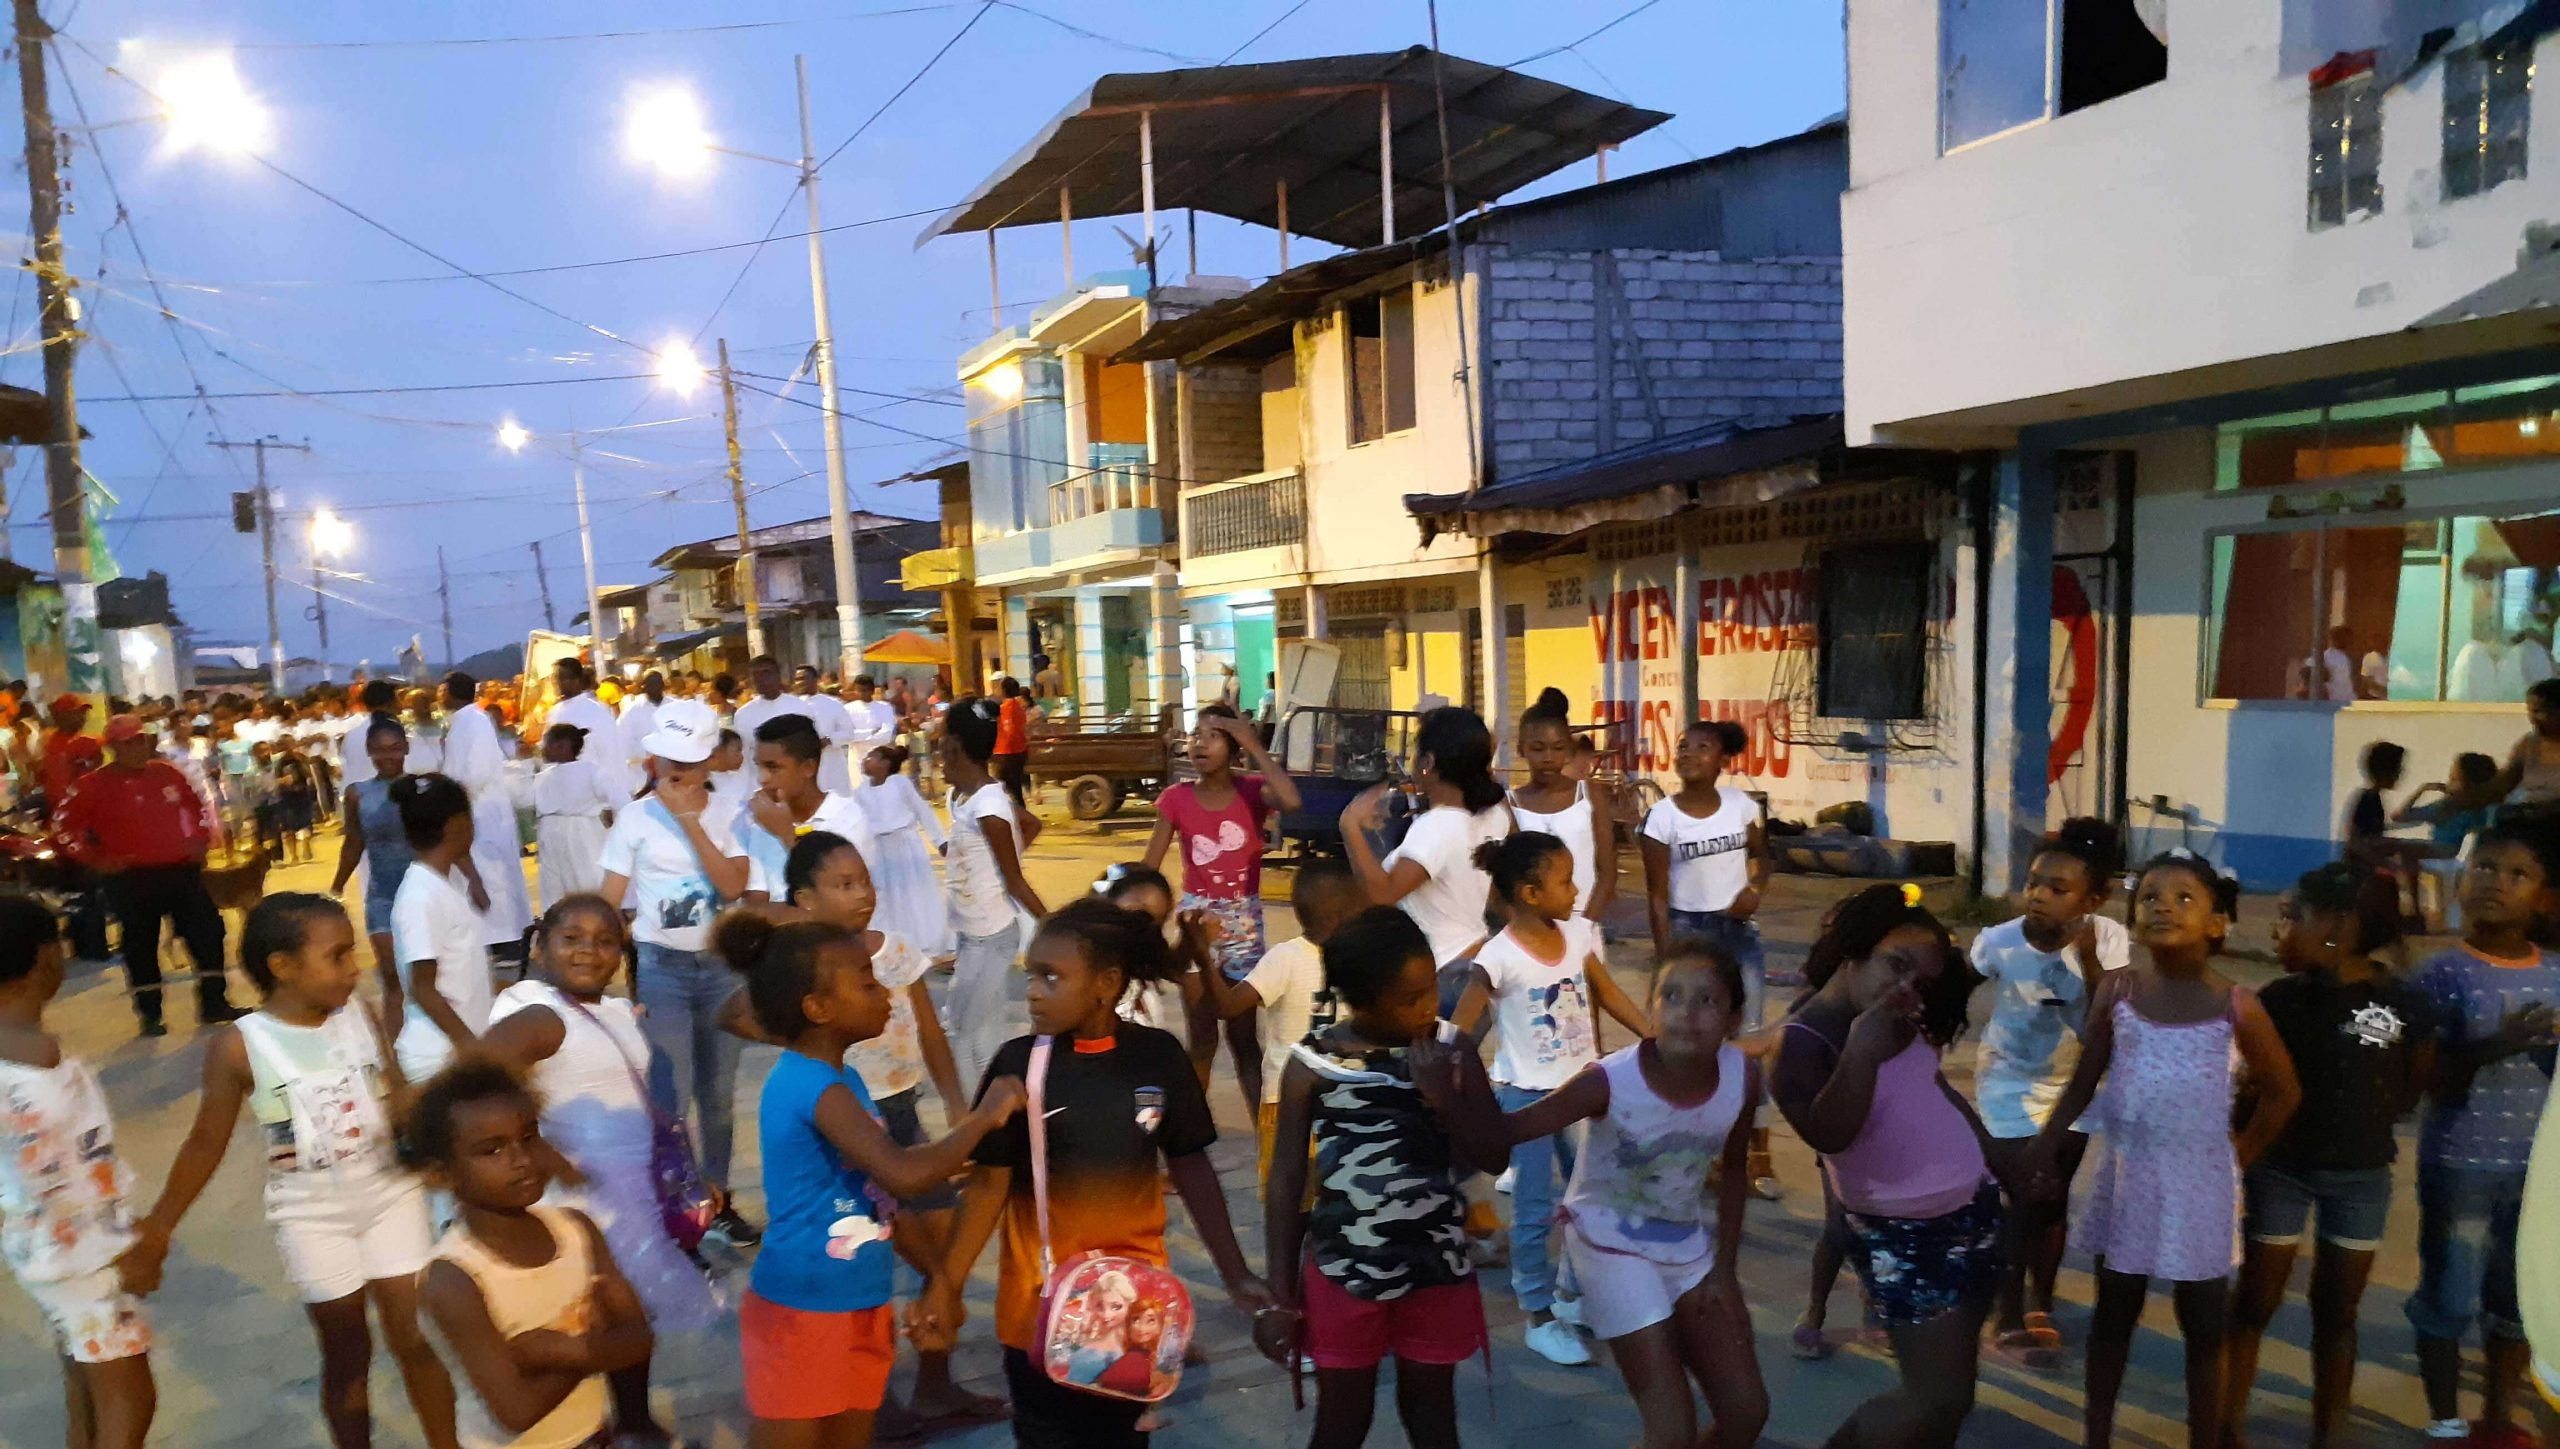 Night gathering of children